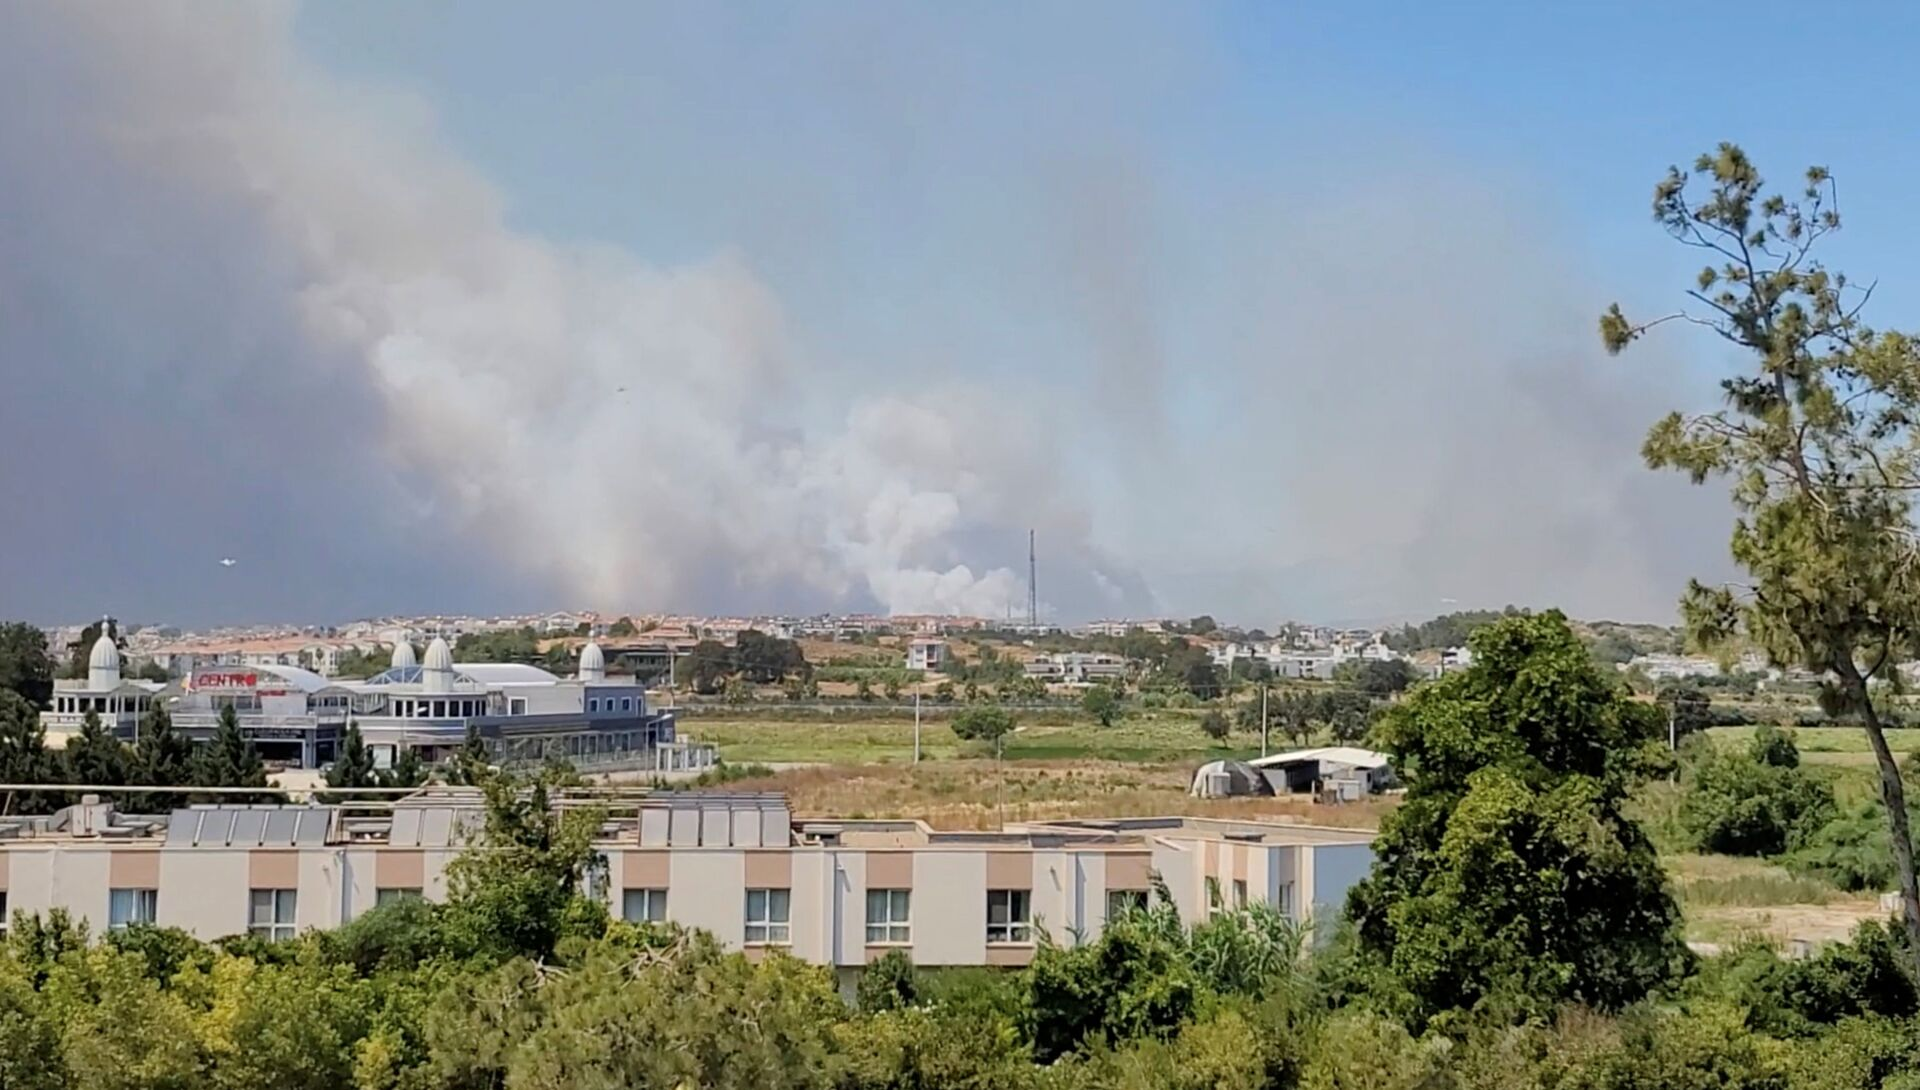 Smoke from a wildfire is seen in Manavgat, Antalya, Turkey July 28, 2021 in this still image taken from social media video.  - Sputnik International, 1920, 07.09.2021